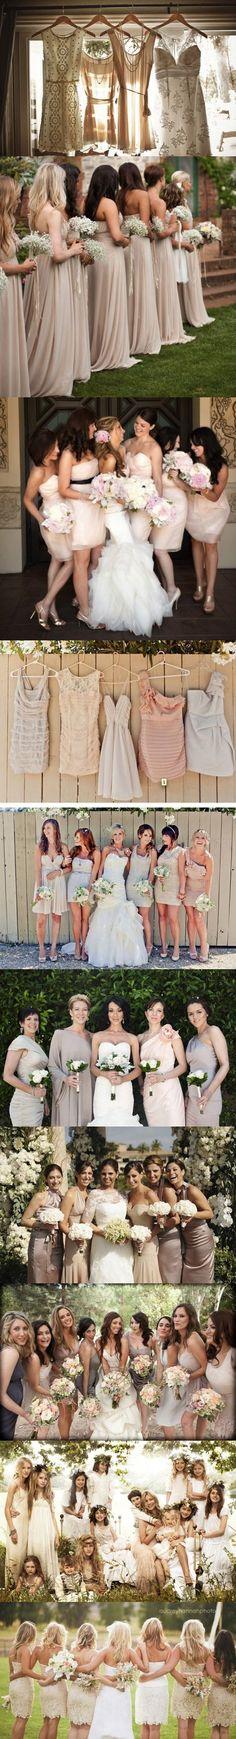 pretty neutrals of every shade! beige, blush, champagne, ivory, cream, tan, khaki, bridesmaids dresses.